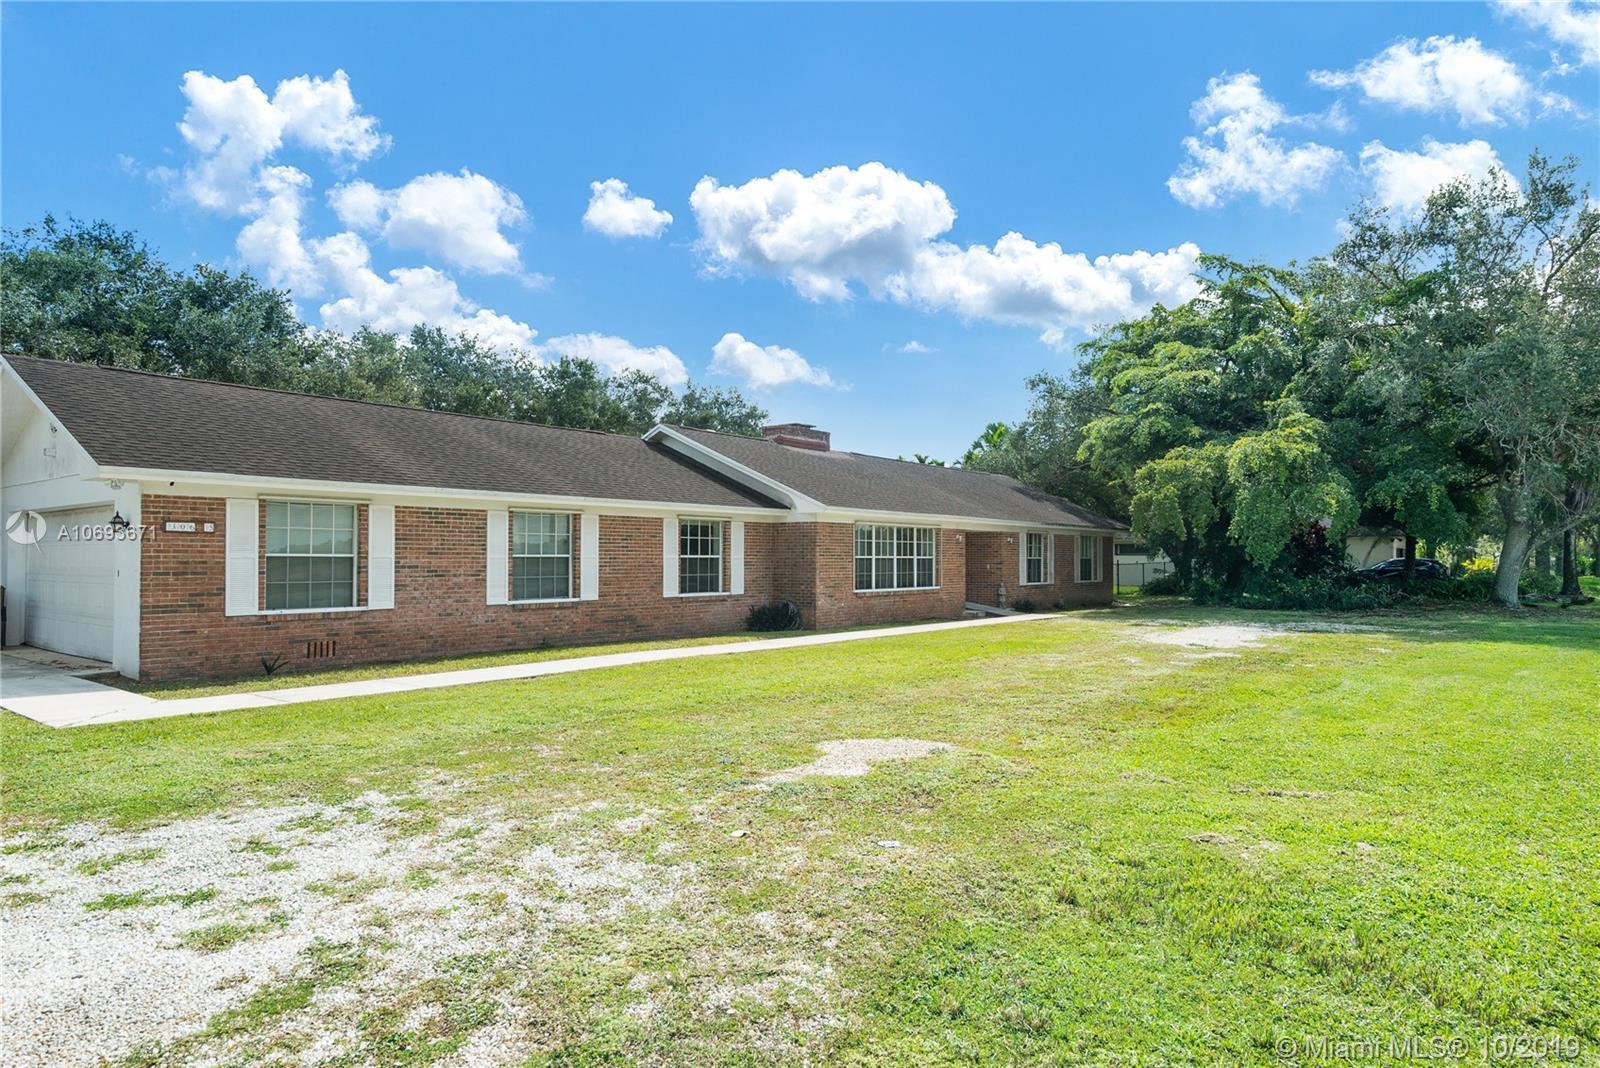 30625 SW 197th Avenue, Homestead, FL 33030 - Homestead, FL real estate listing